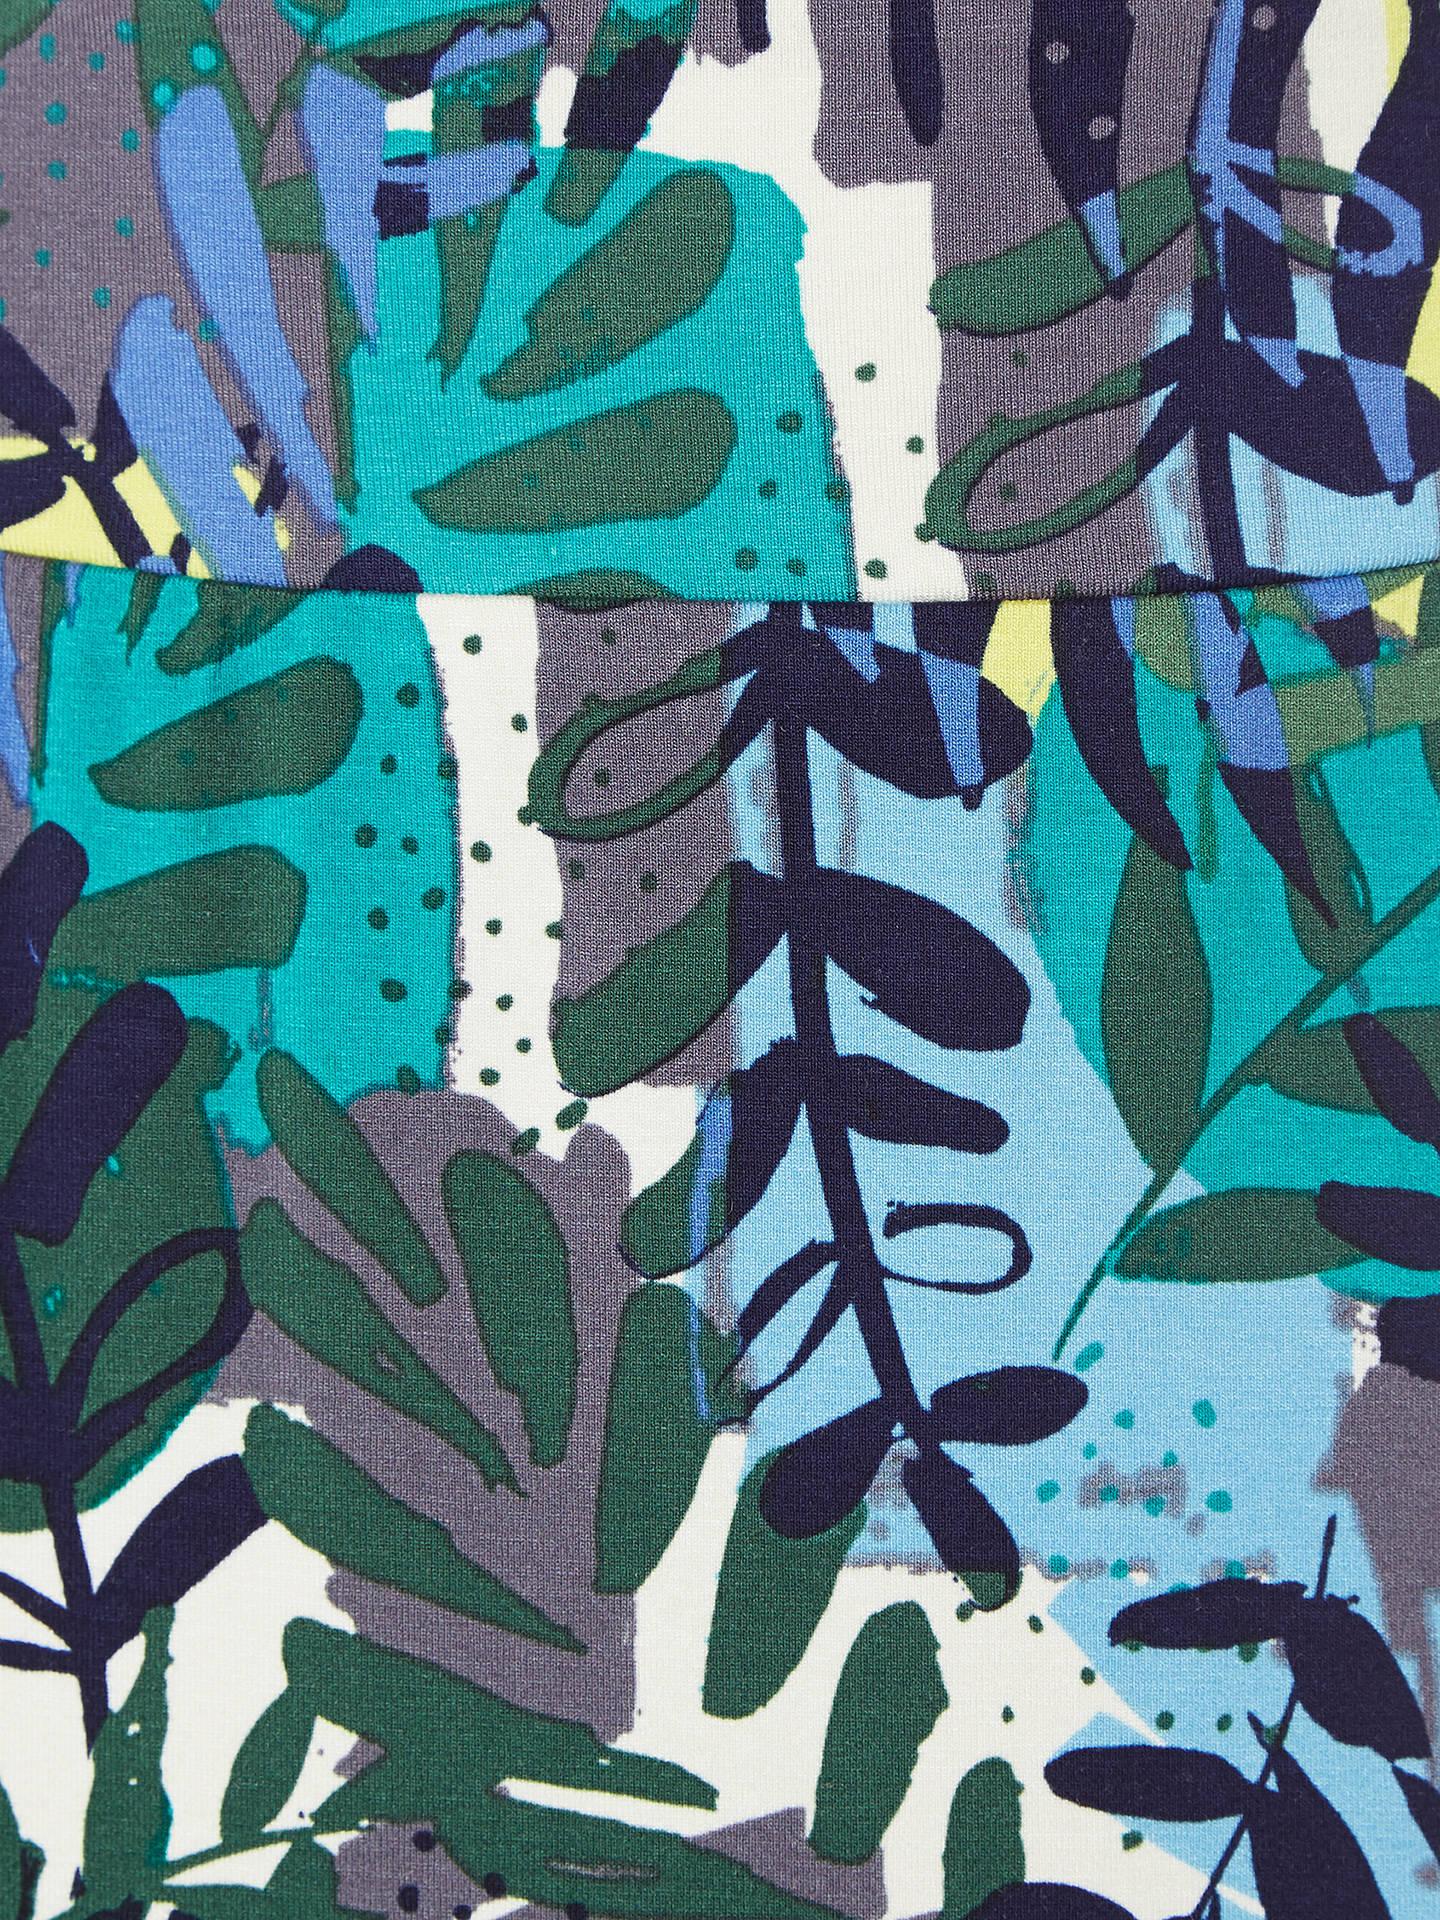 a7cde0de06 Buy White Stuff Tropical Leaf Print Jersey Skirt, Multi, 6 Online at  johnlewis.